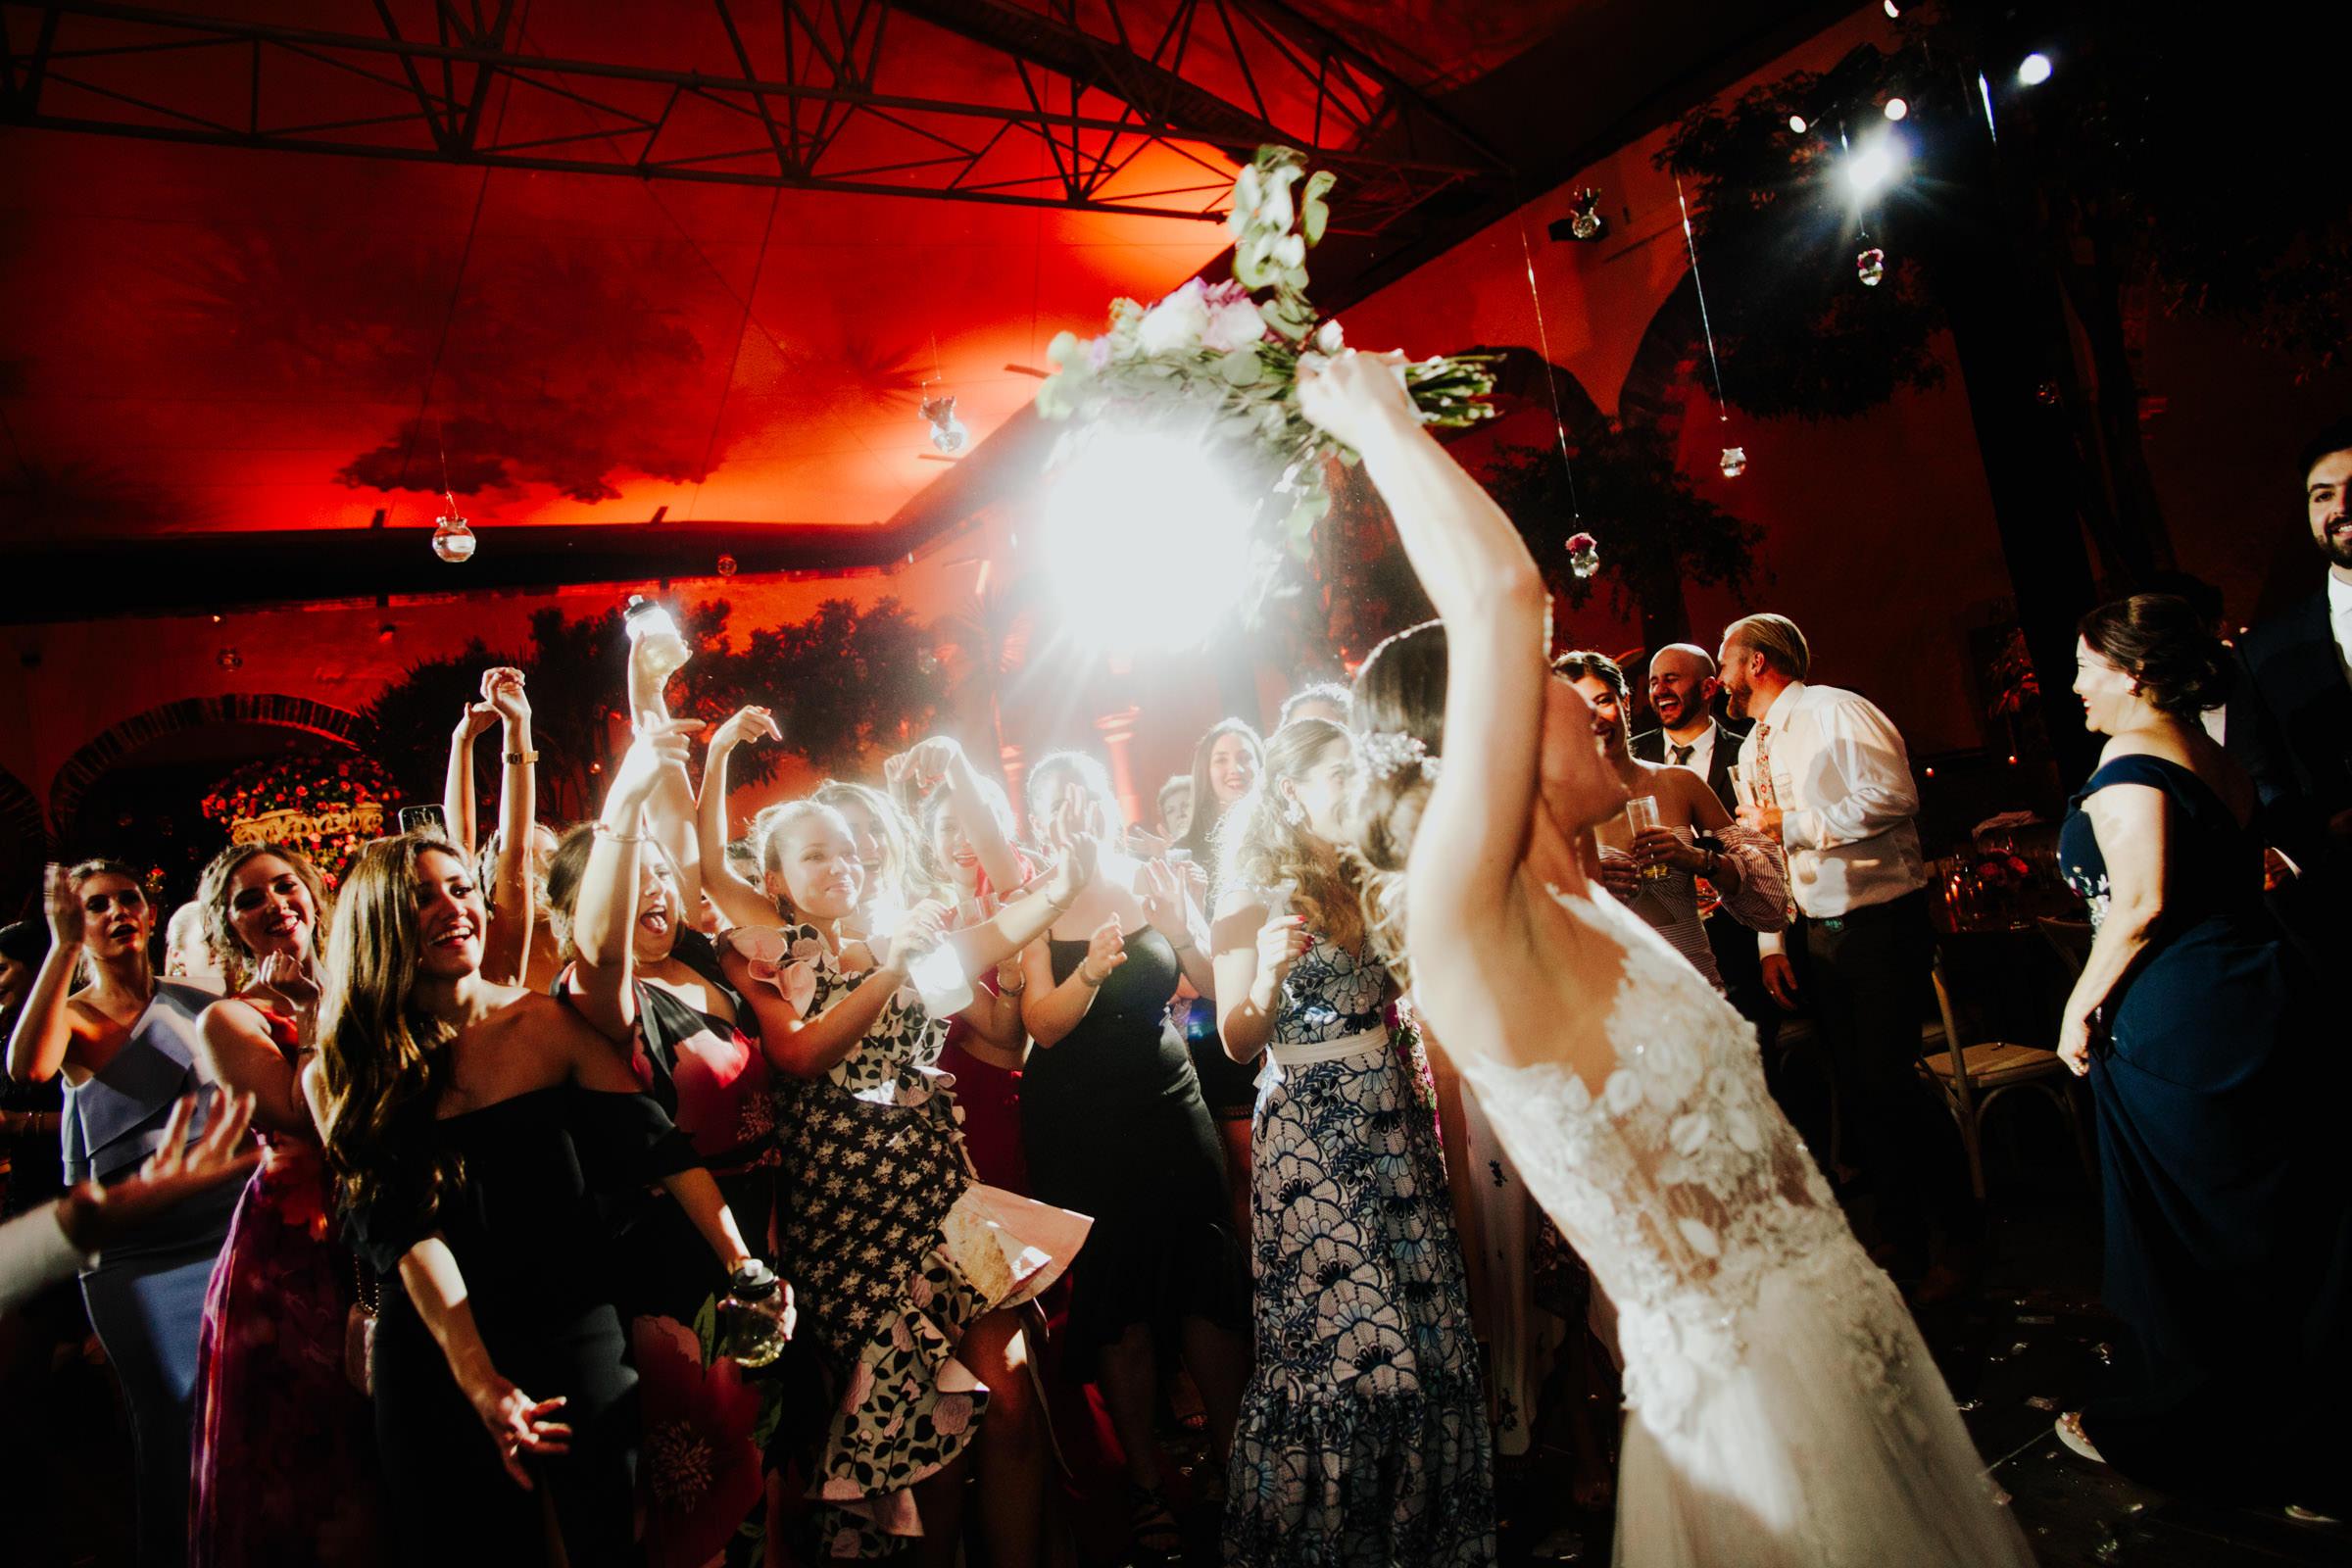 San-Miguel-de-Allende-Wedding-Photography-Parroquia-Instituto-Boda-Fotografia-Fer-Sergio-Pierce-Lifestyle-Photography0080.JPG